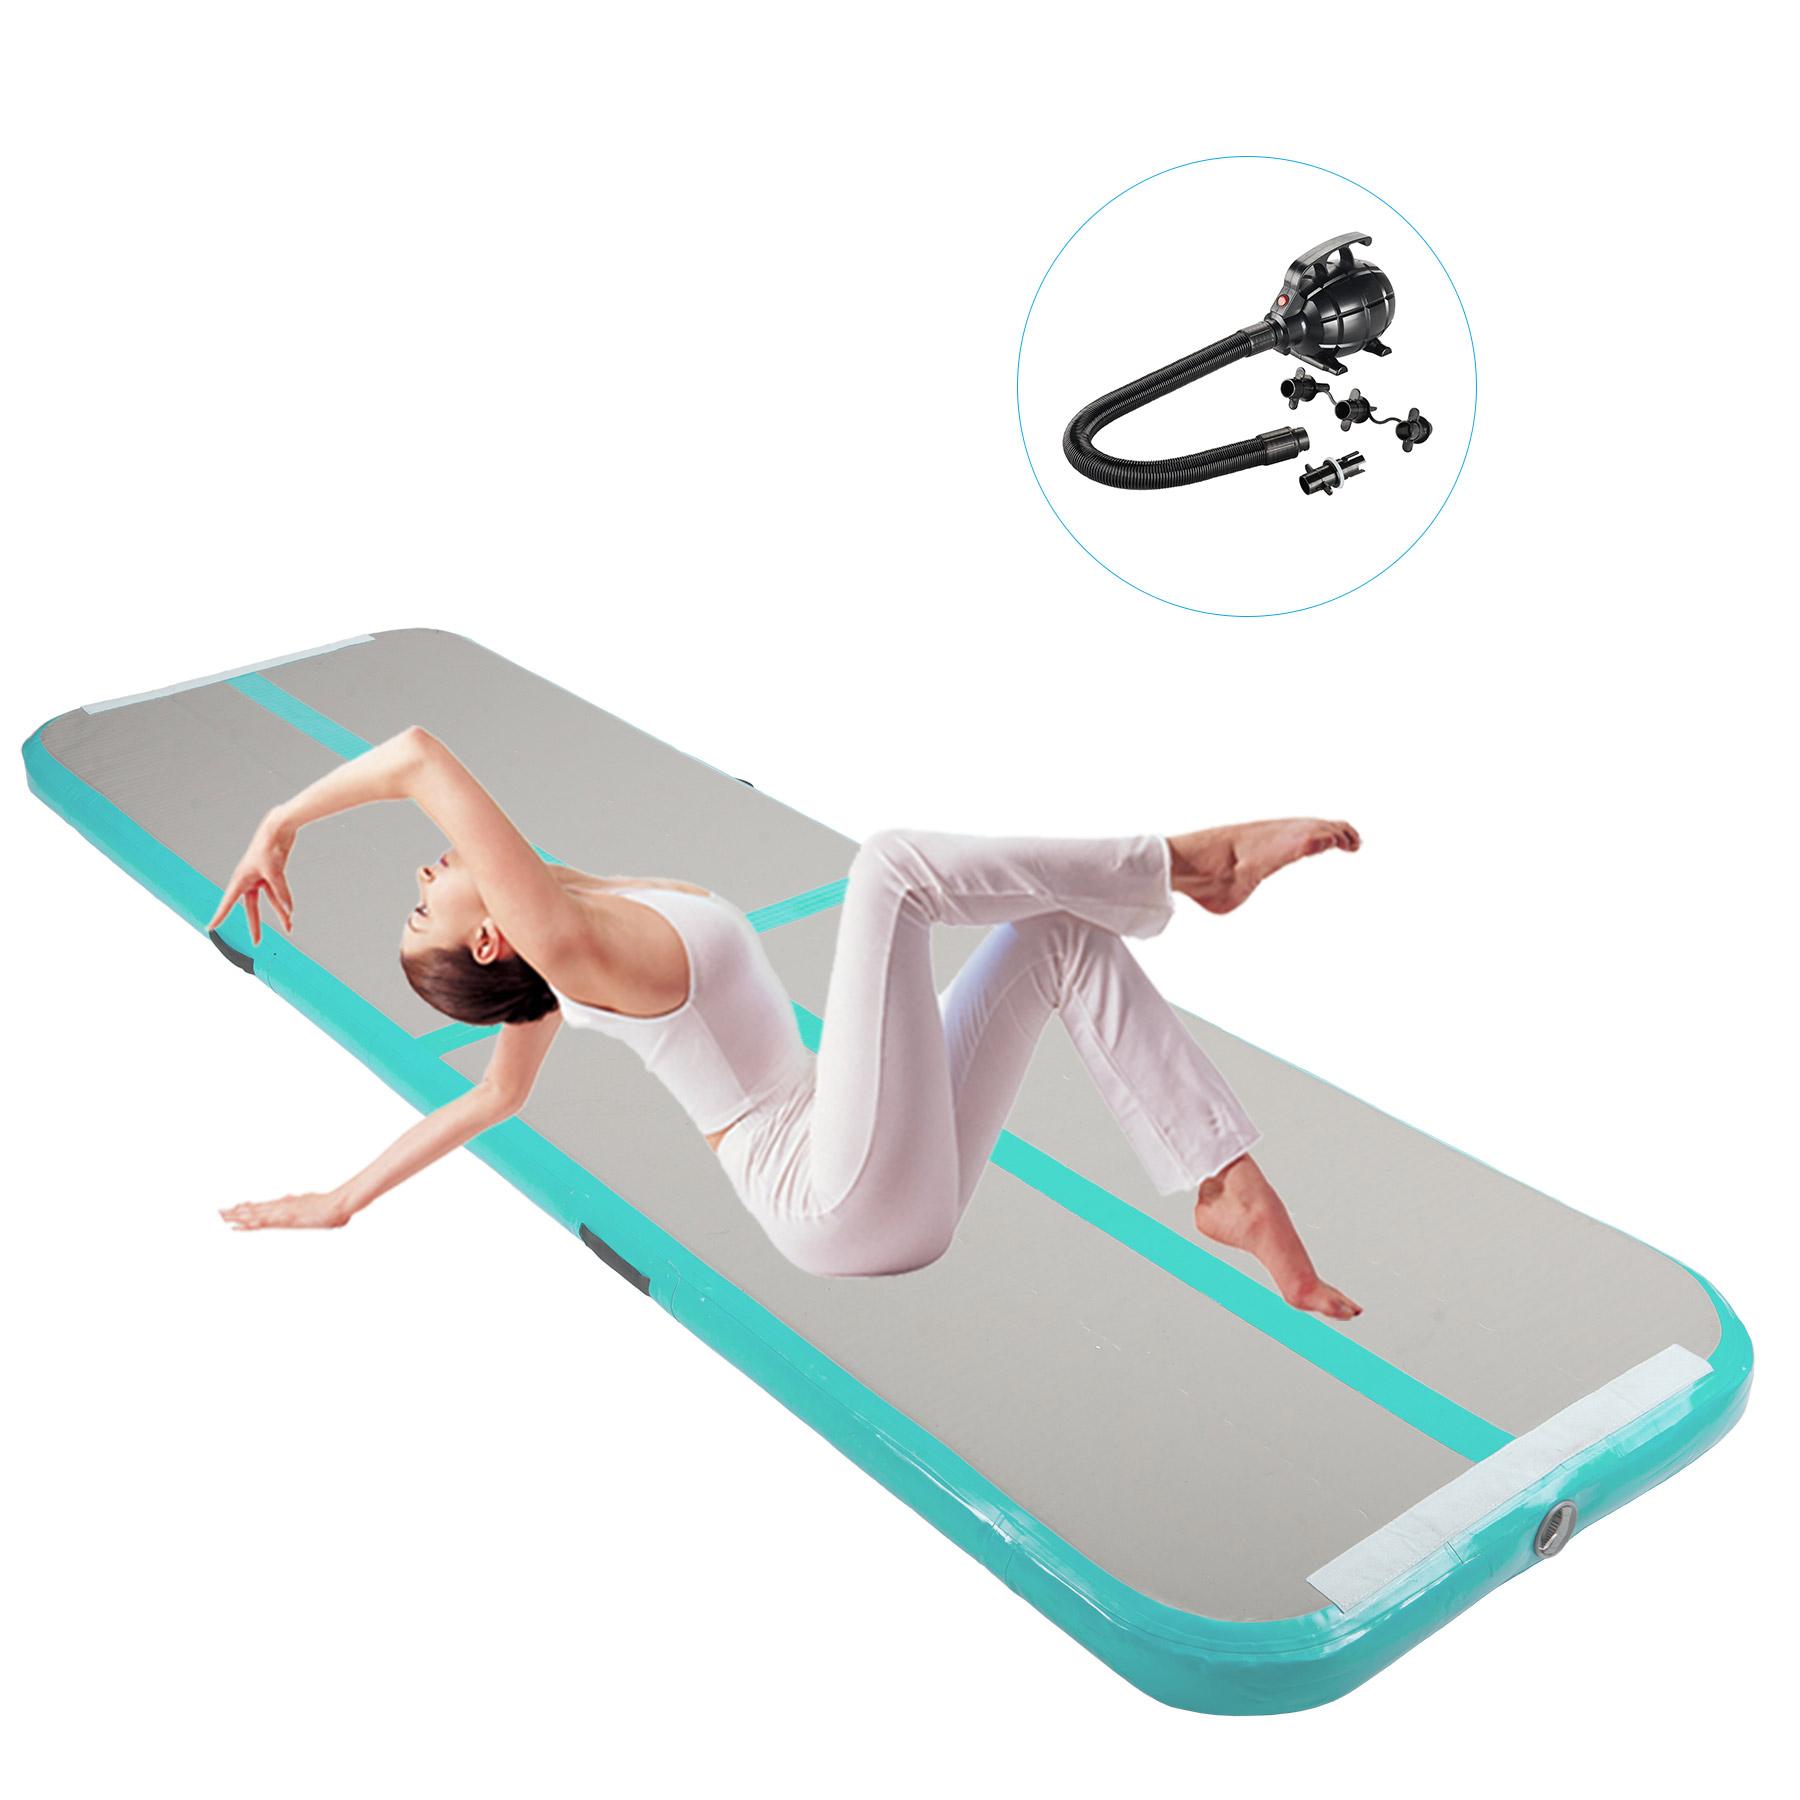 Air Track Inflatable Tumbling Home Gymnastics Tumbling Mat w/Electric Air Pump